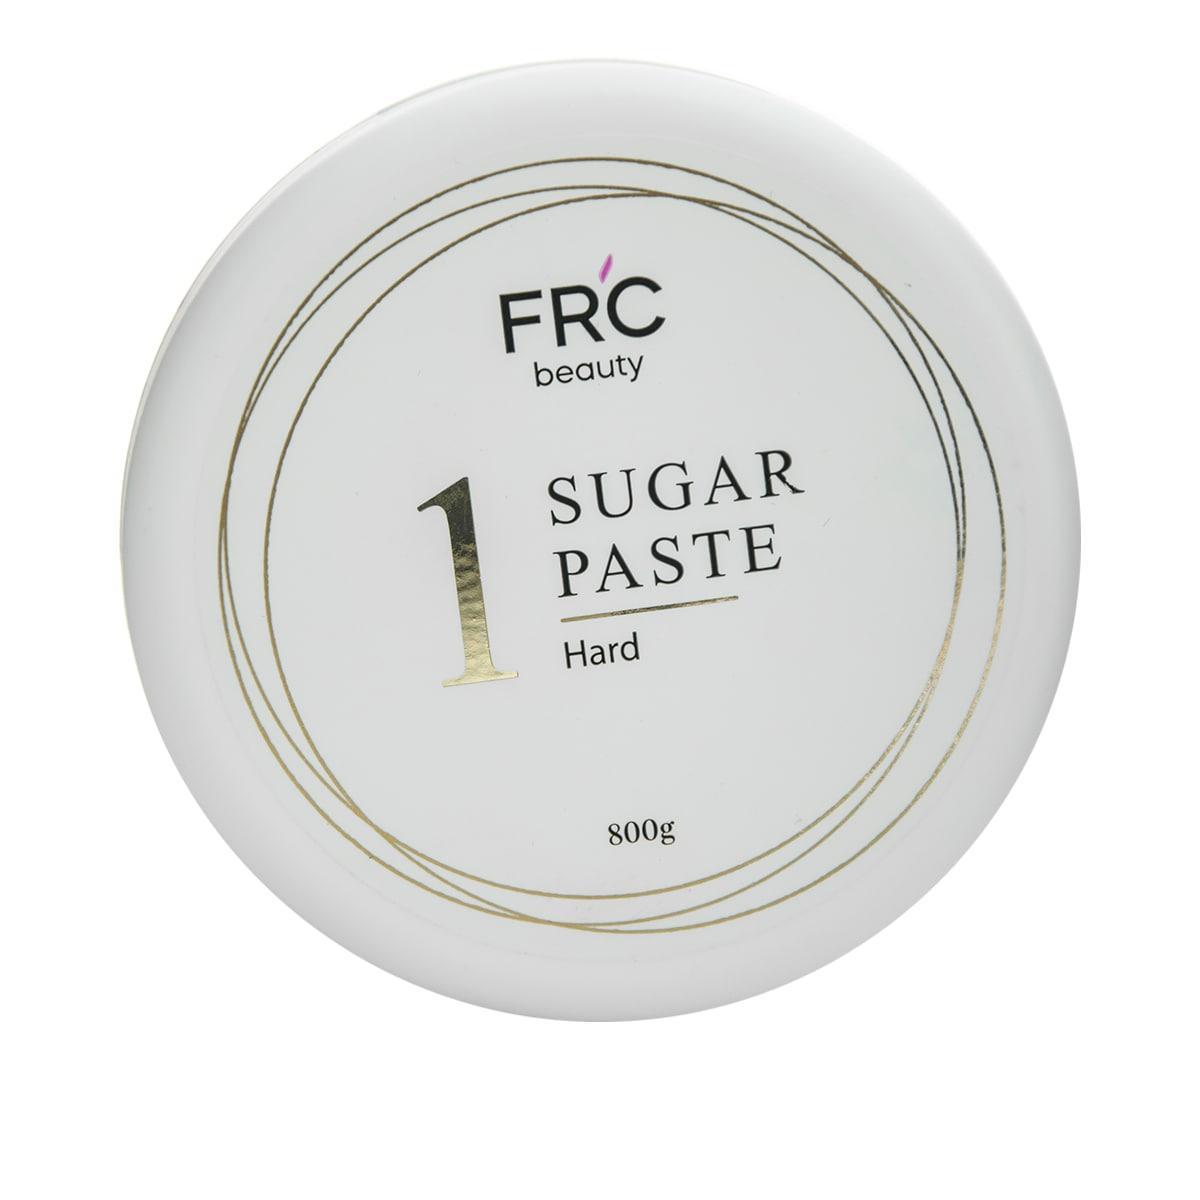 Шугаринг FRC Beauty 800 г (Hard) - Для шугаринга Сахарная паста хард жесткой плотности